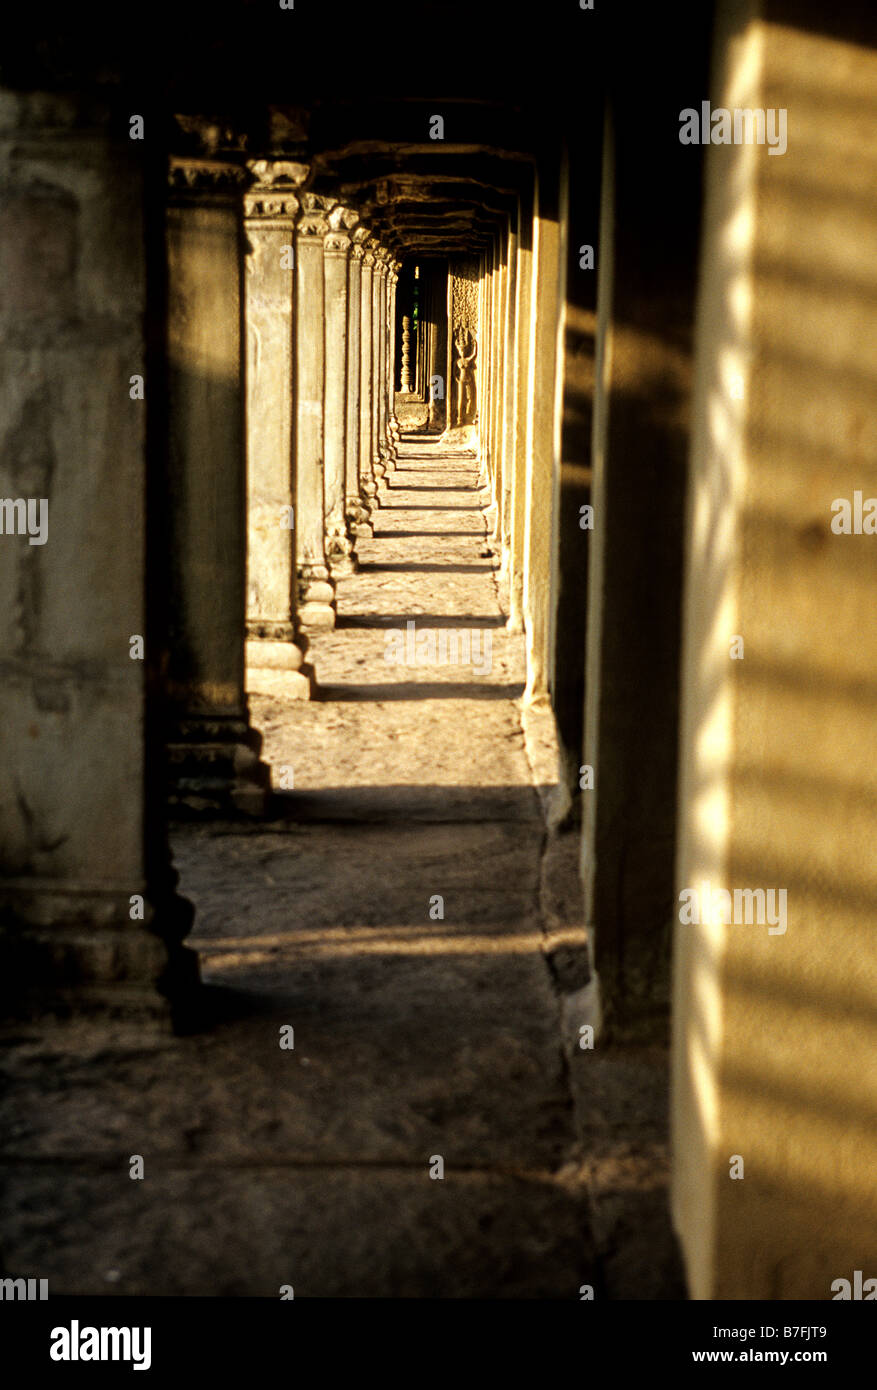 Rovine del XII secolo tempio Khmer di Angkor Wat- Angkor Wat rovine vicino a Siem Reap, Cambogia Immagini Stock